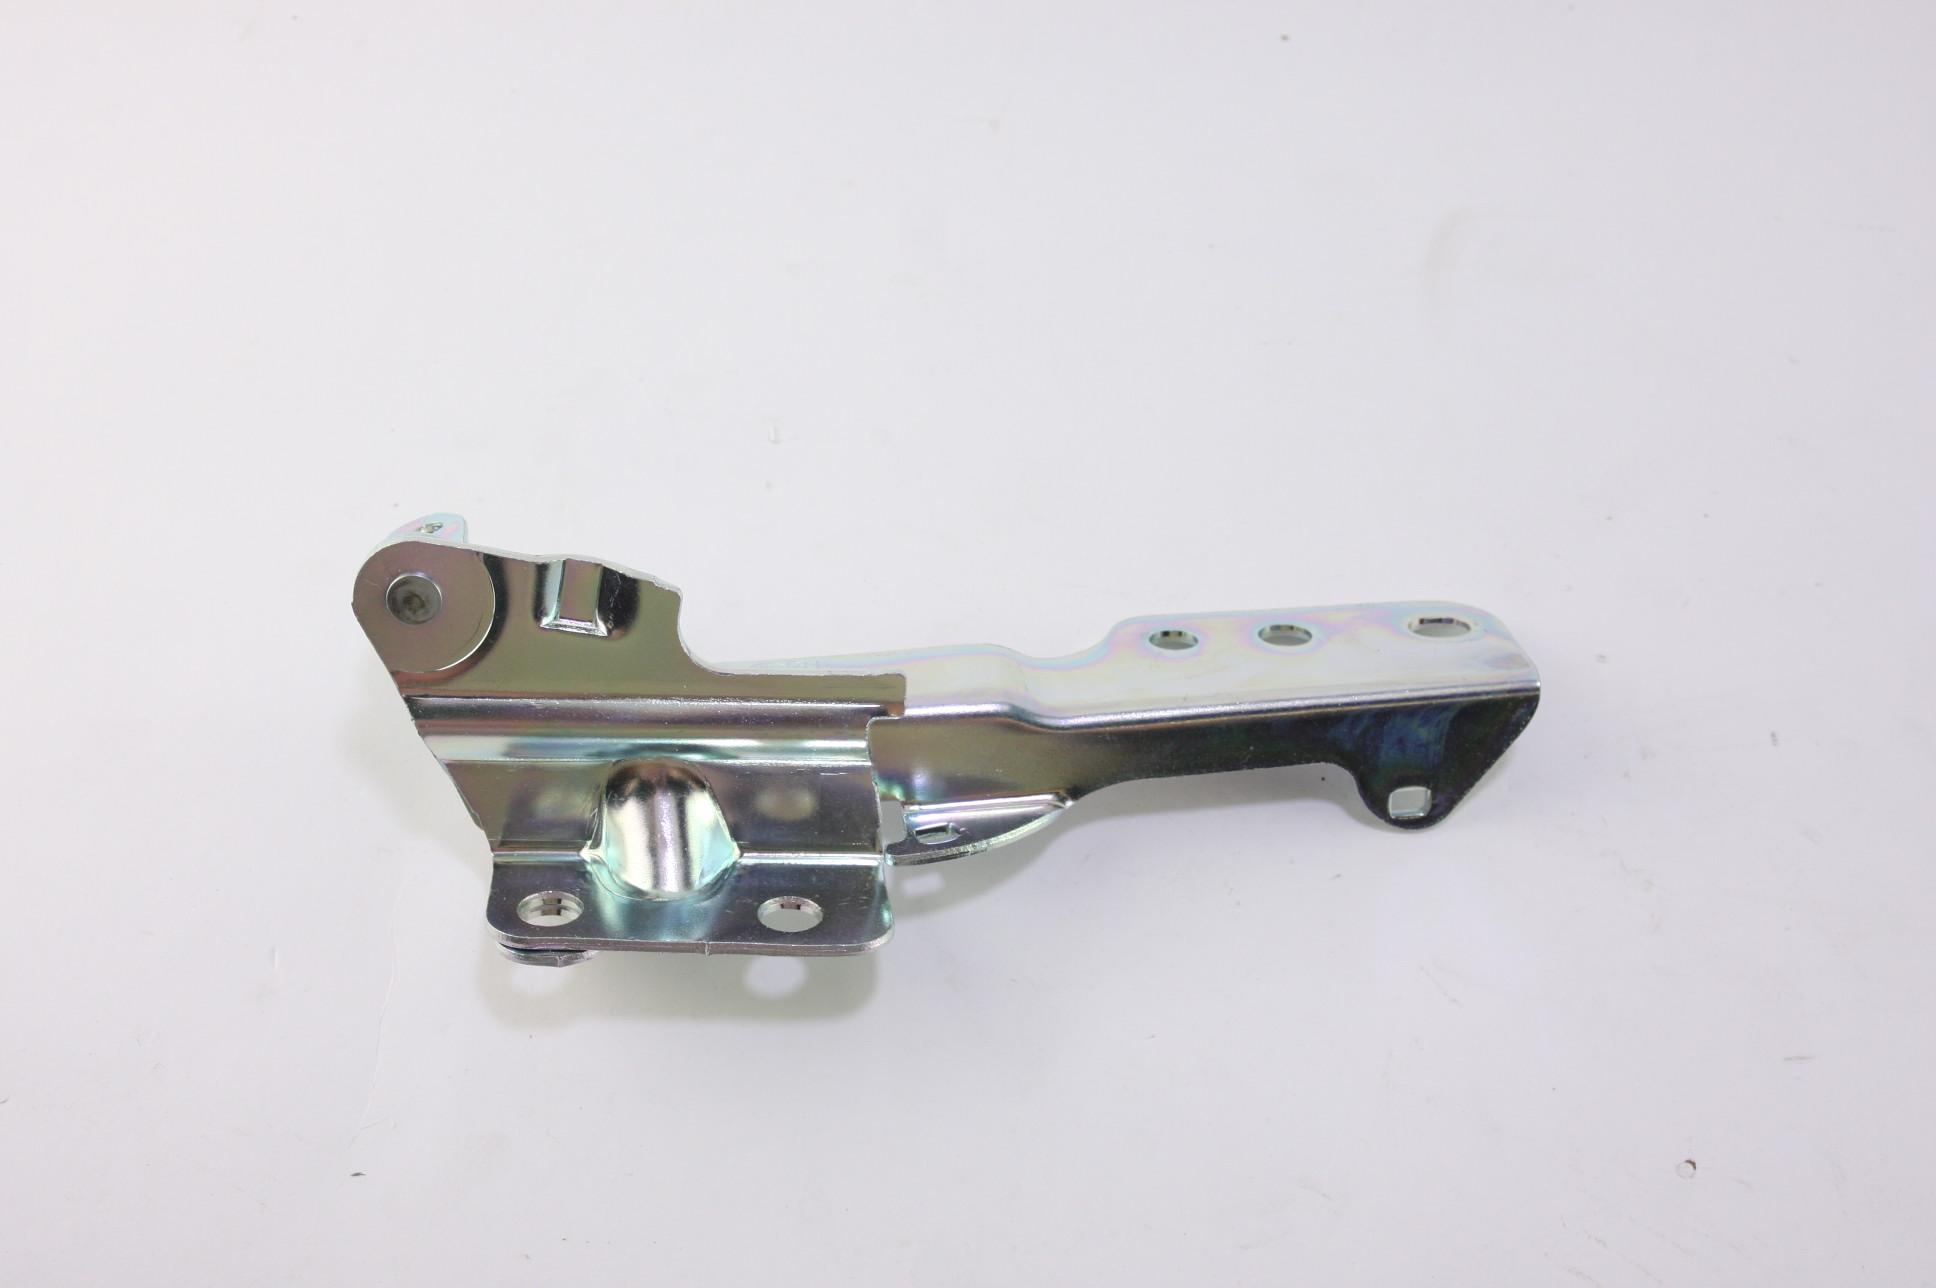 ** New Genuine KIA OEM 791203E000 Right Hood Hinge 2003-2009 Sorento NIP - image 7